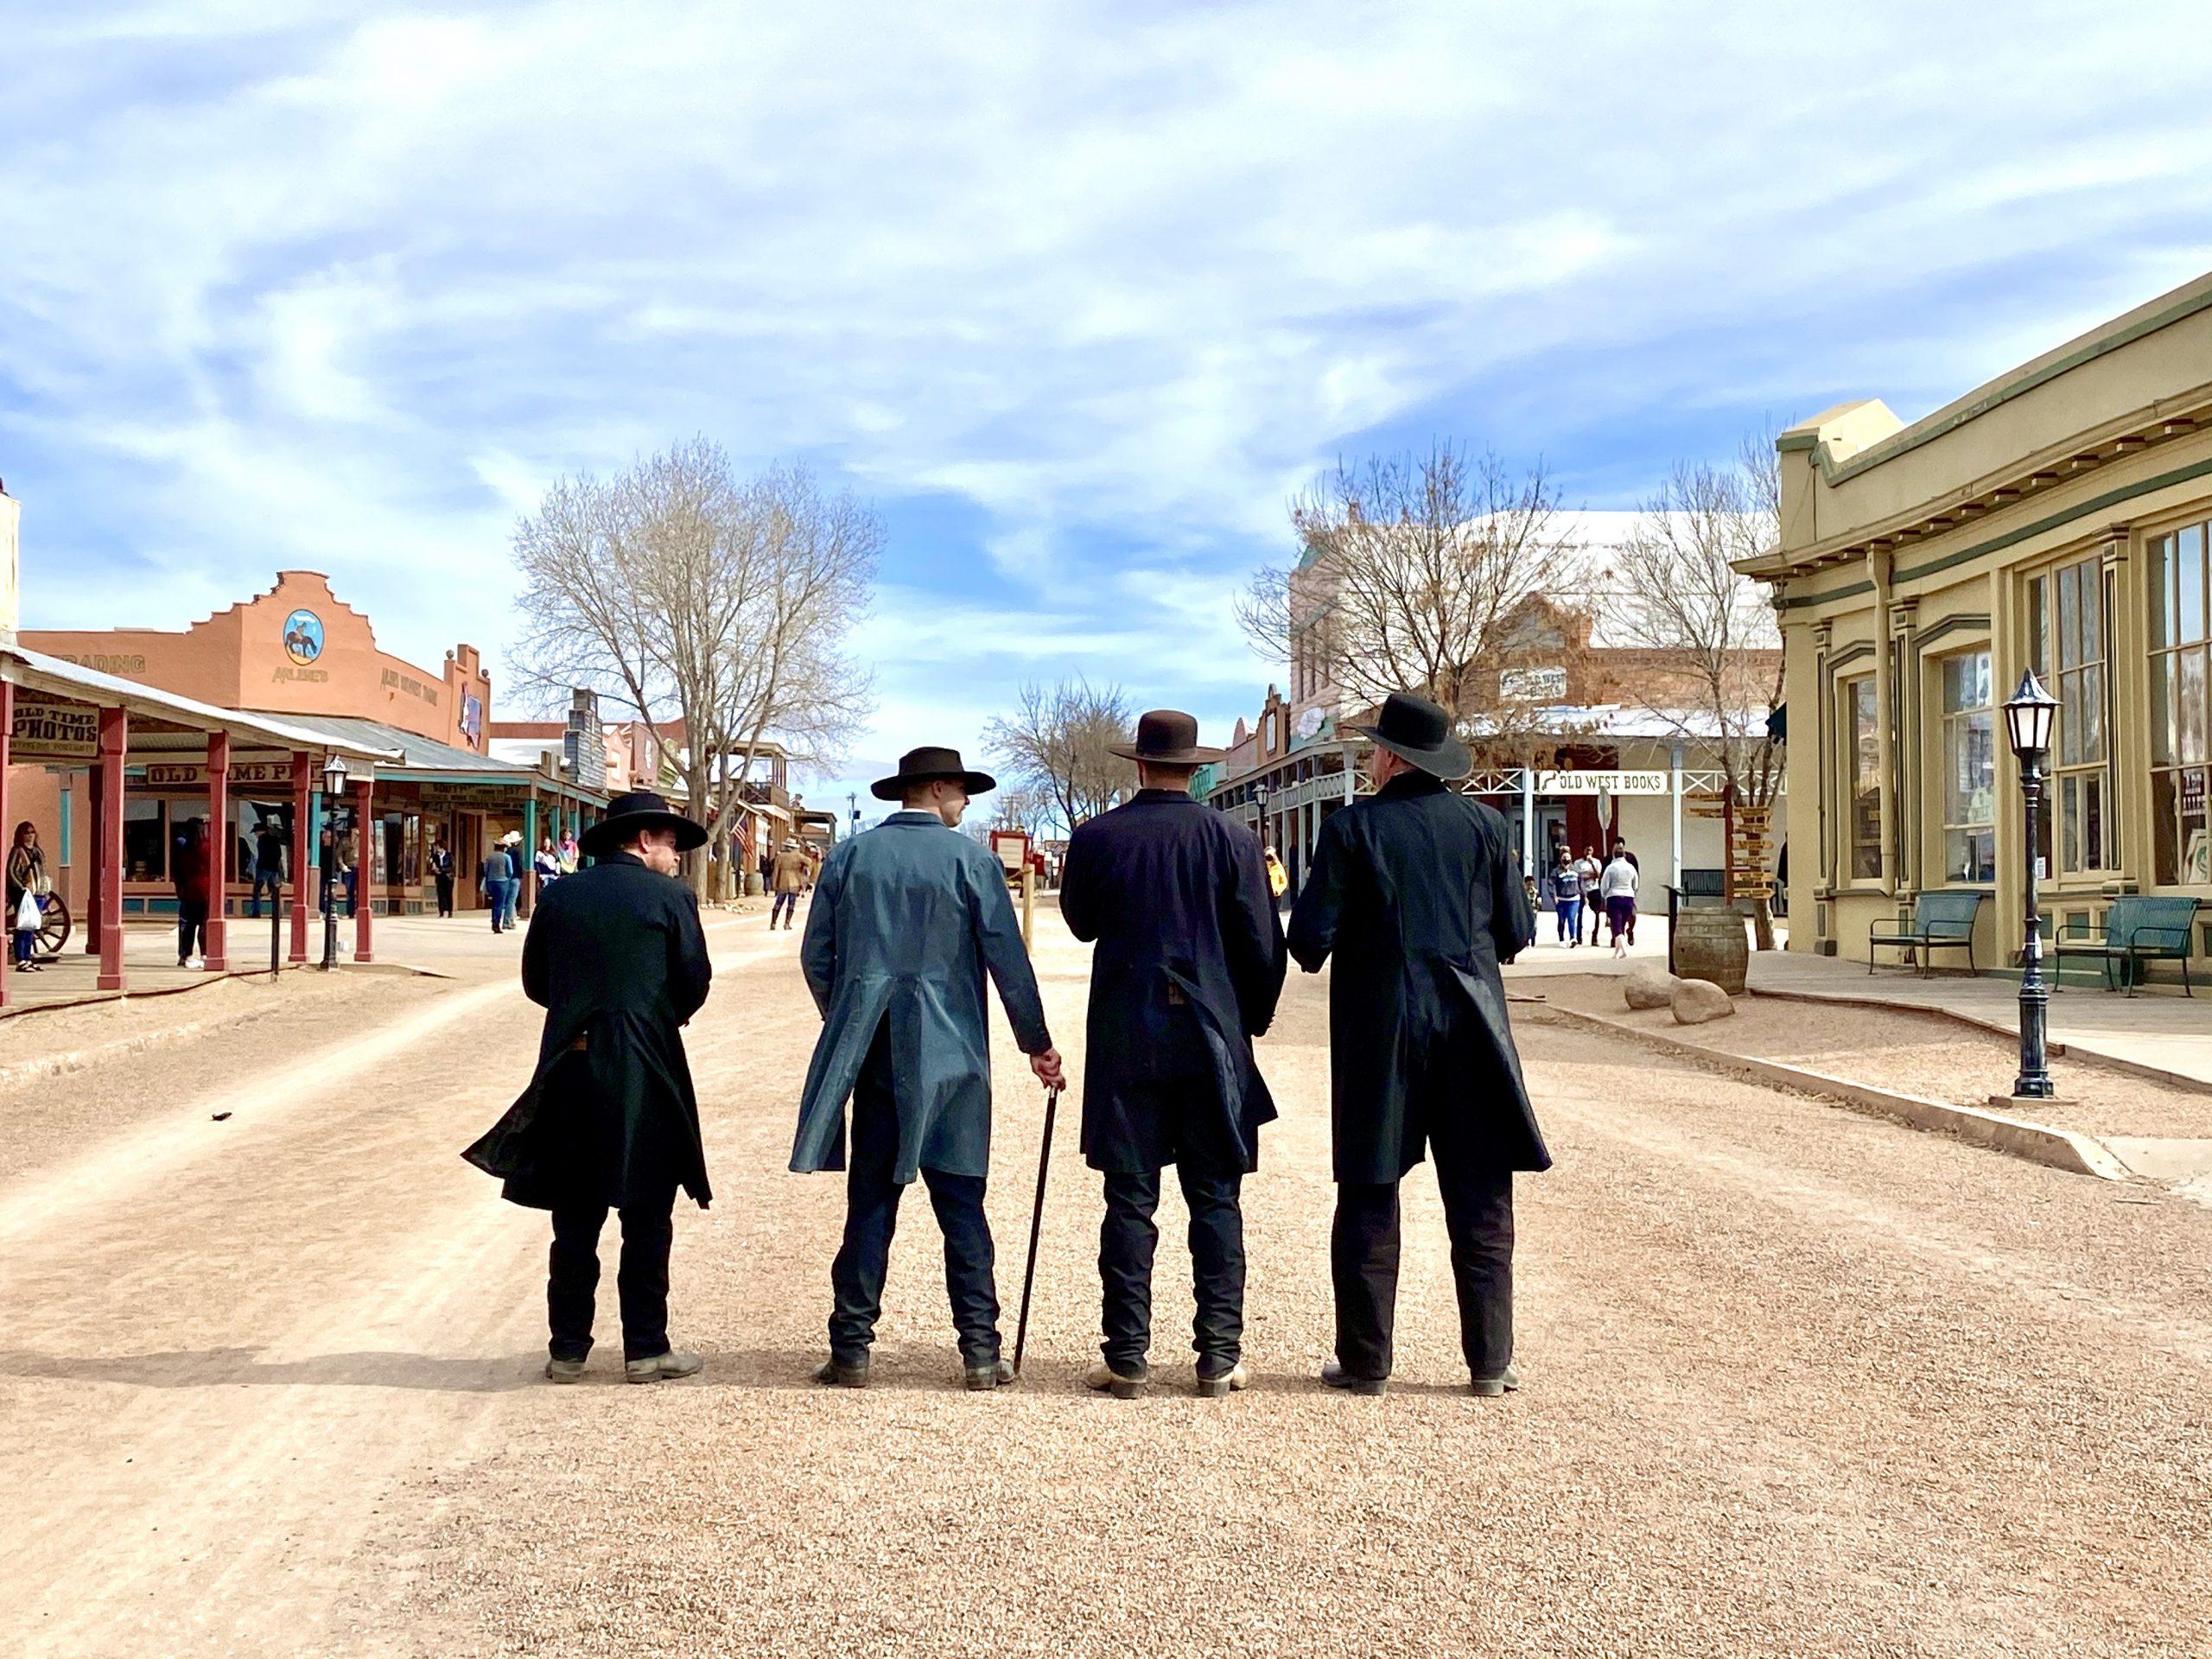 Gunslingers line up outside the OK Corral in Tombstone, Arizona